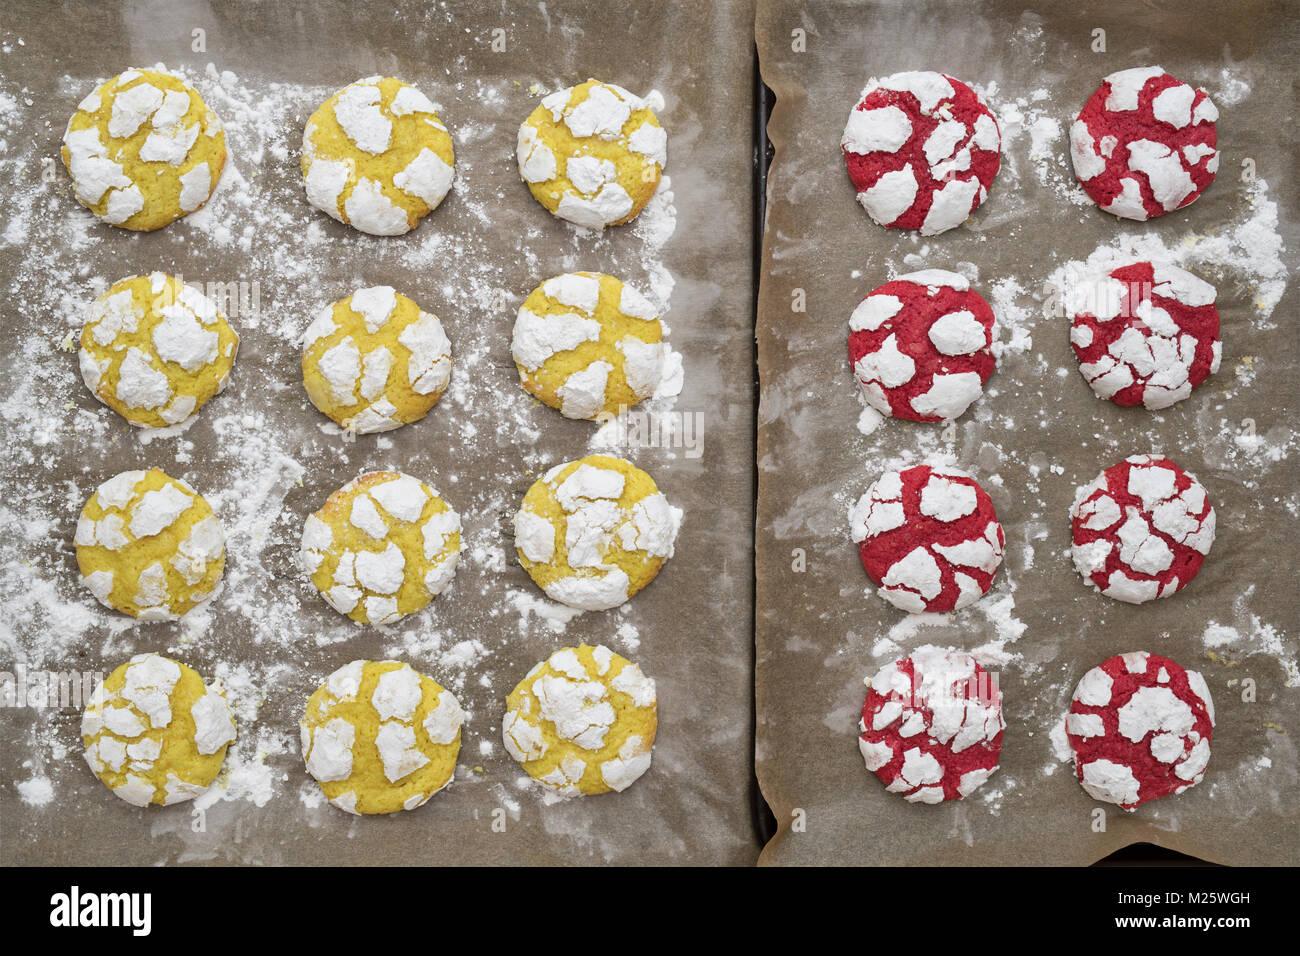 Homemade Lemon and Raspberry Crinkle Cookies on baking sheets. UK - Stock Image